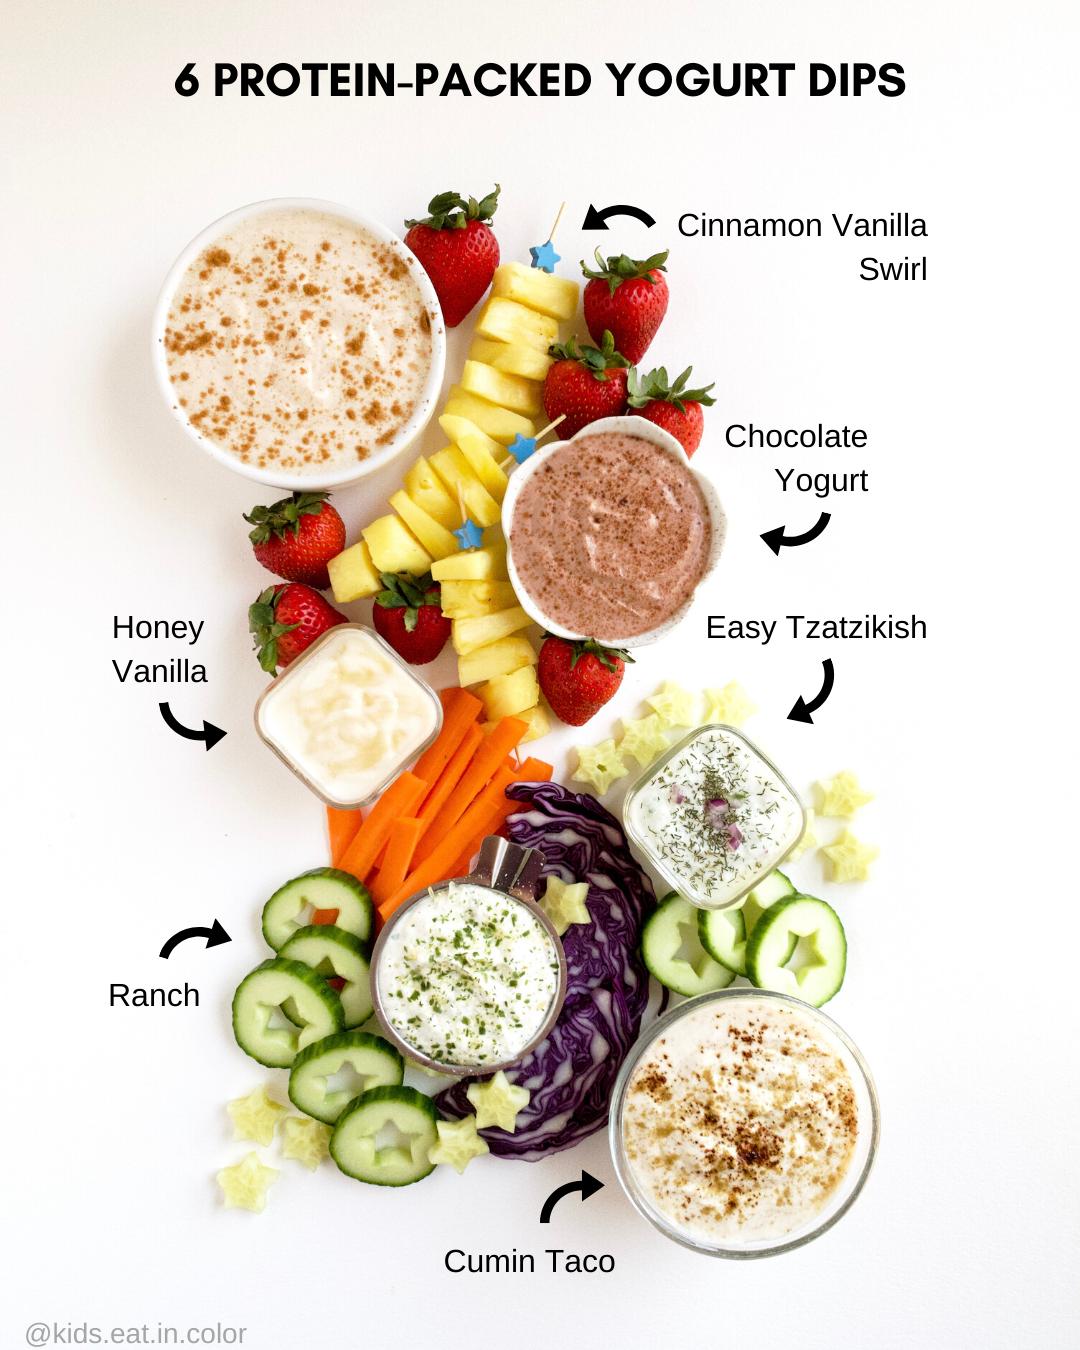 My Secret For Getting Kids To Eat Fruits Vegetables Kids Eat In Color Baby Food Recipes Children Eating Kids Veggies